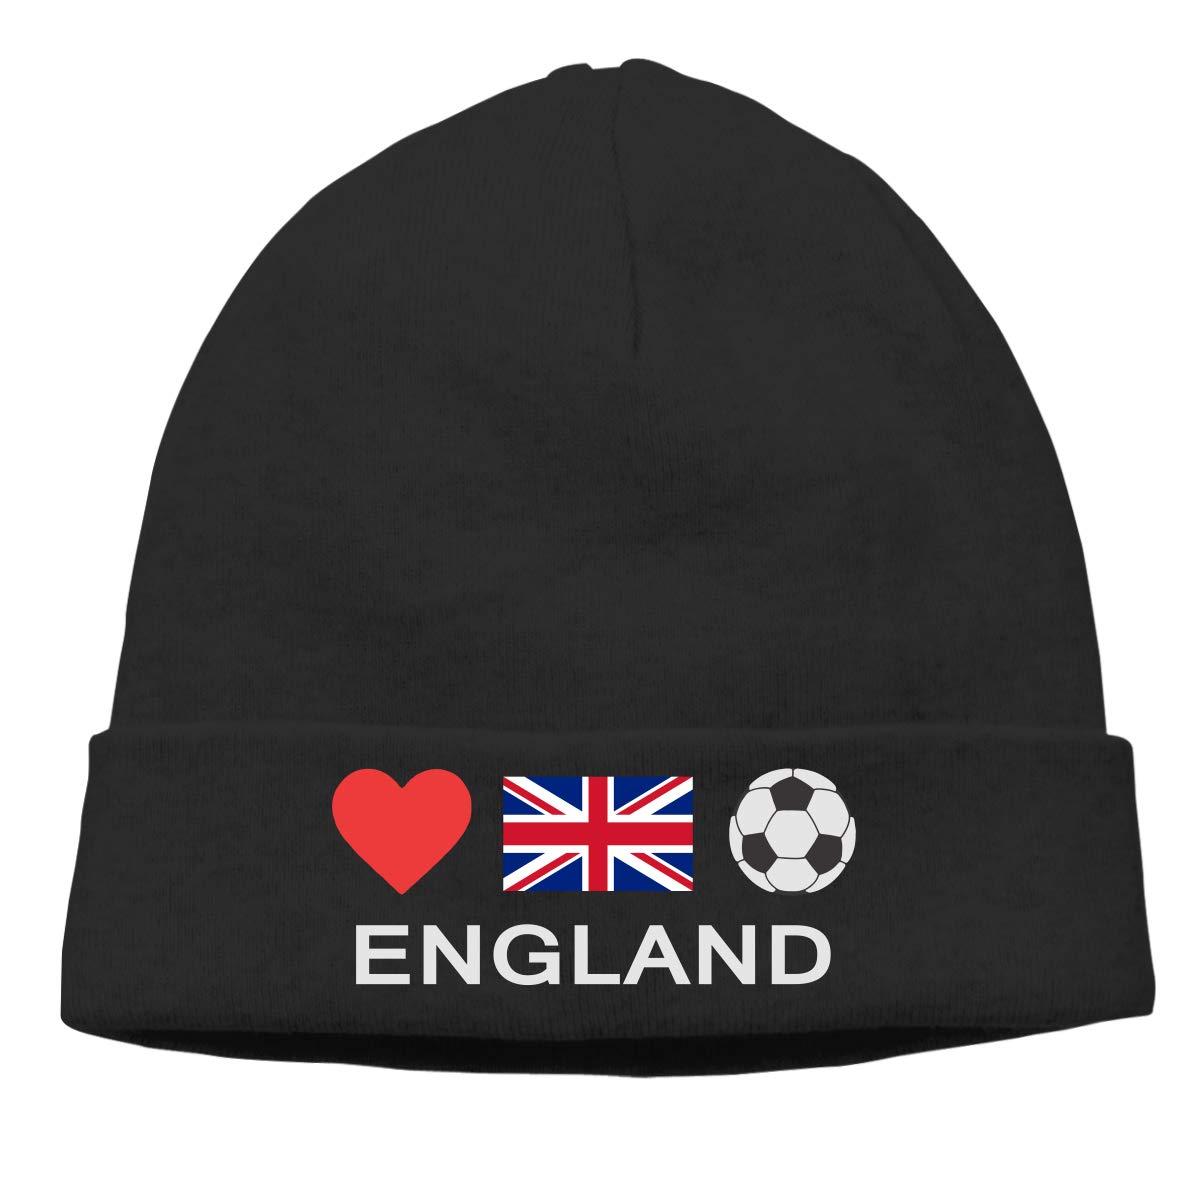 Amazon.com  KELLYMOLL England Football England Soccer Comfortable Adult  Men s and Women s Wool Cap Black  Clothing 2421aa0cb69